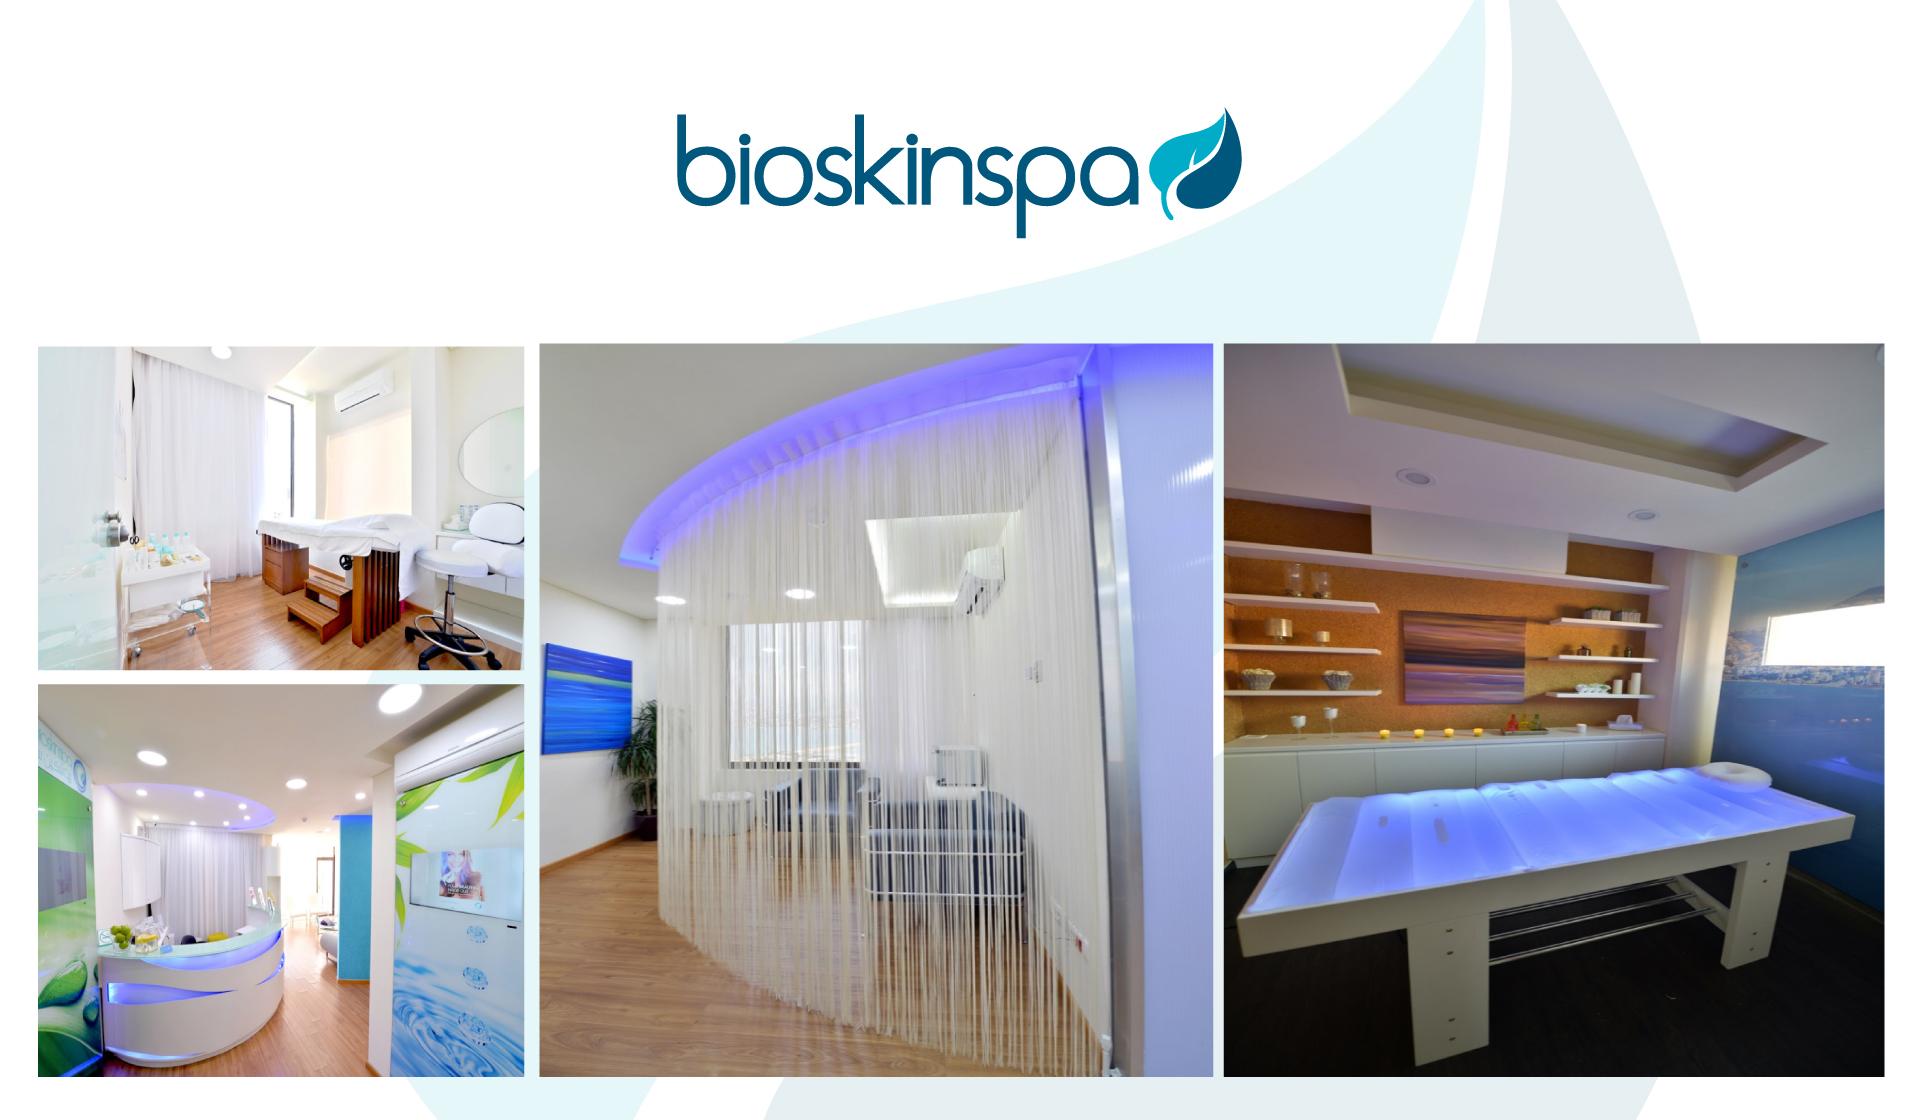 Bioskinspa